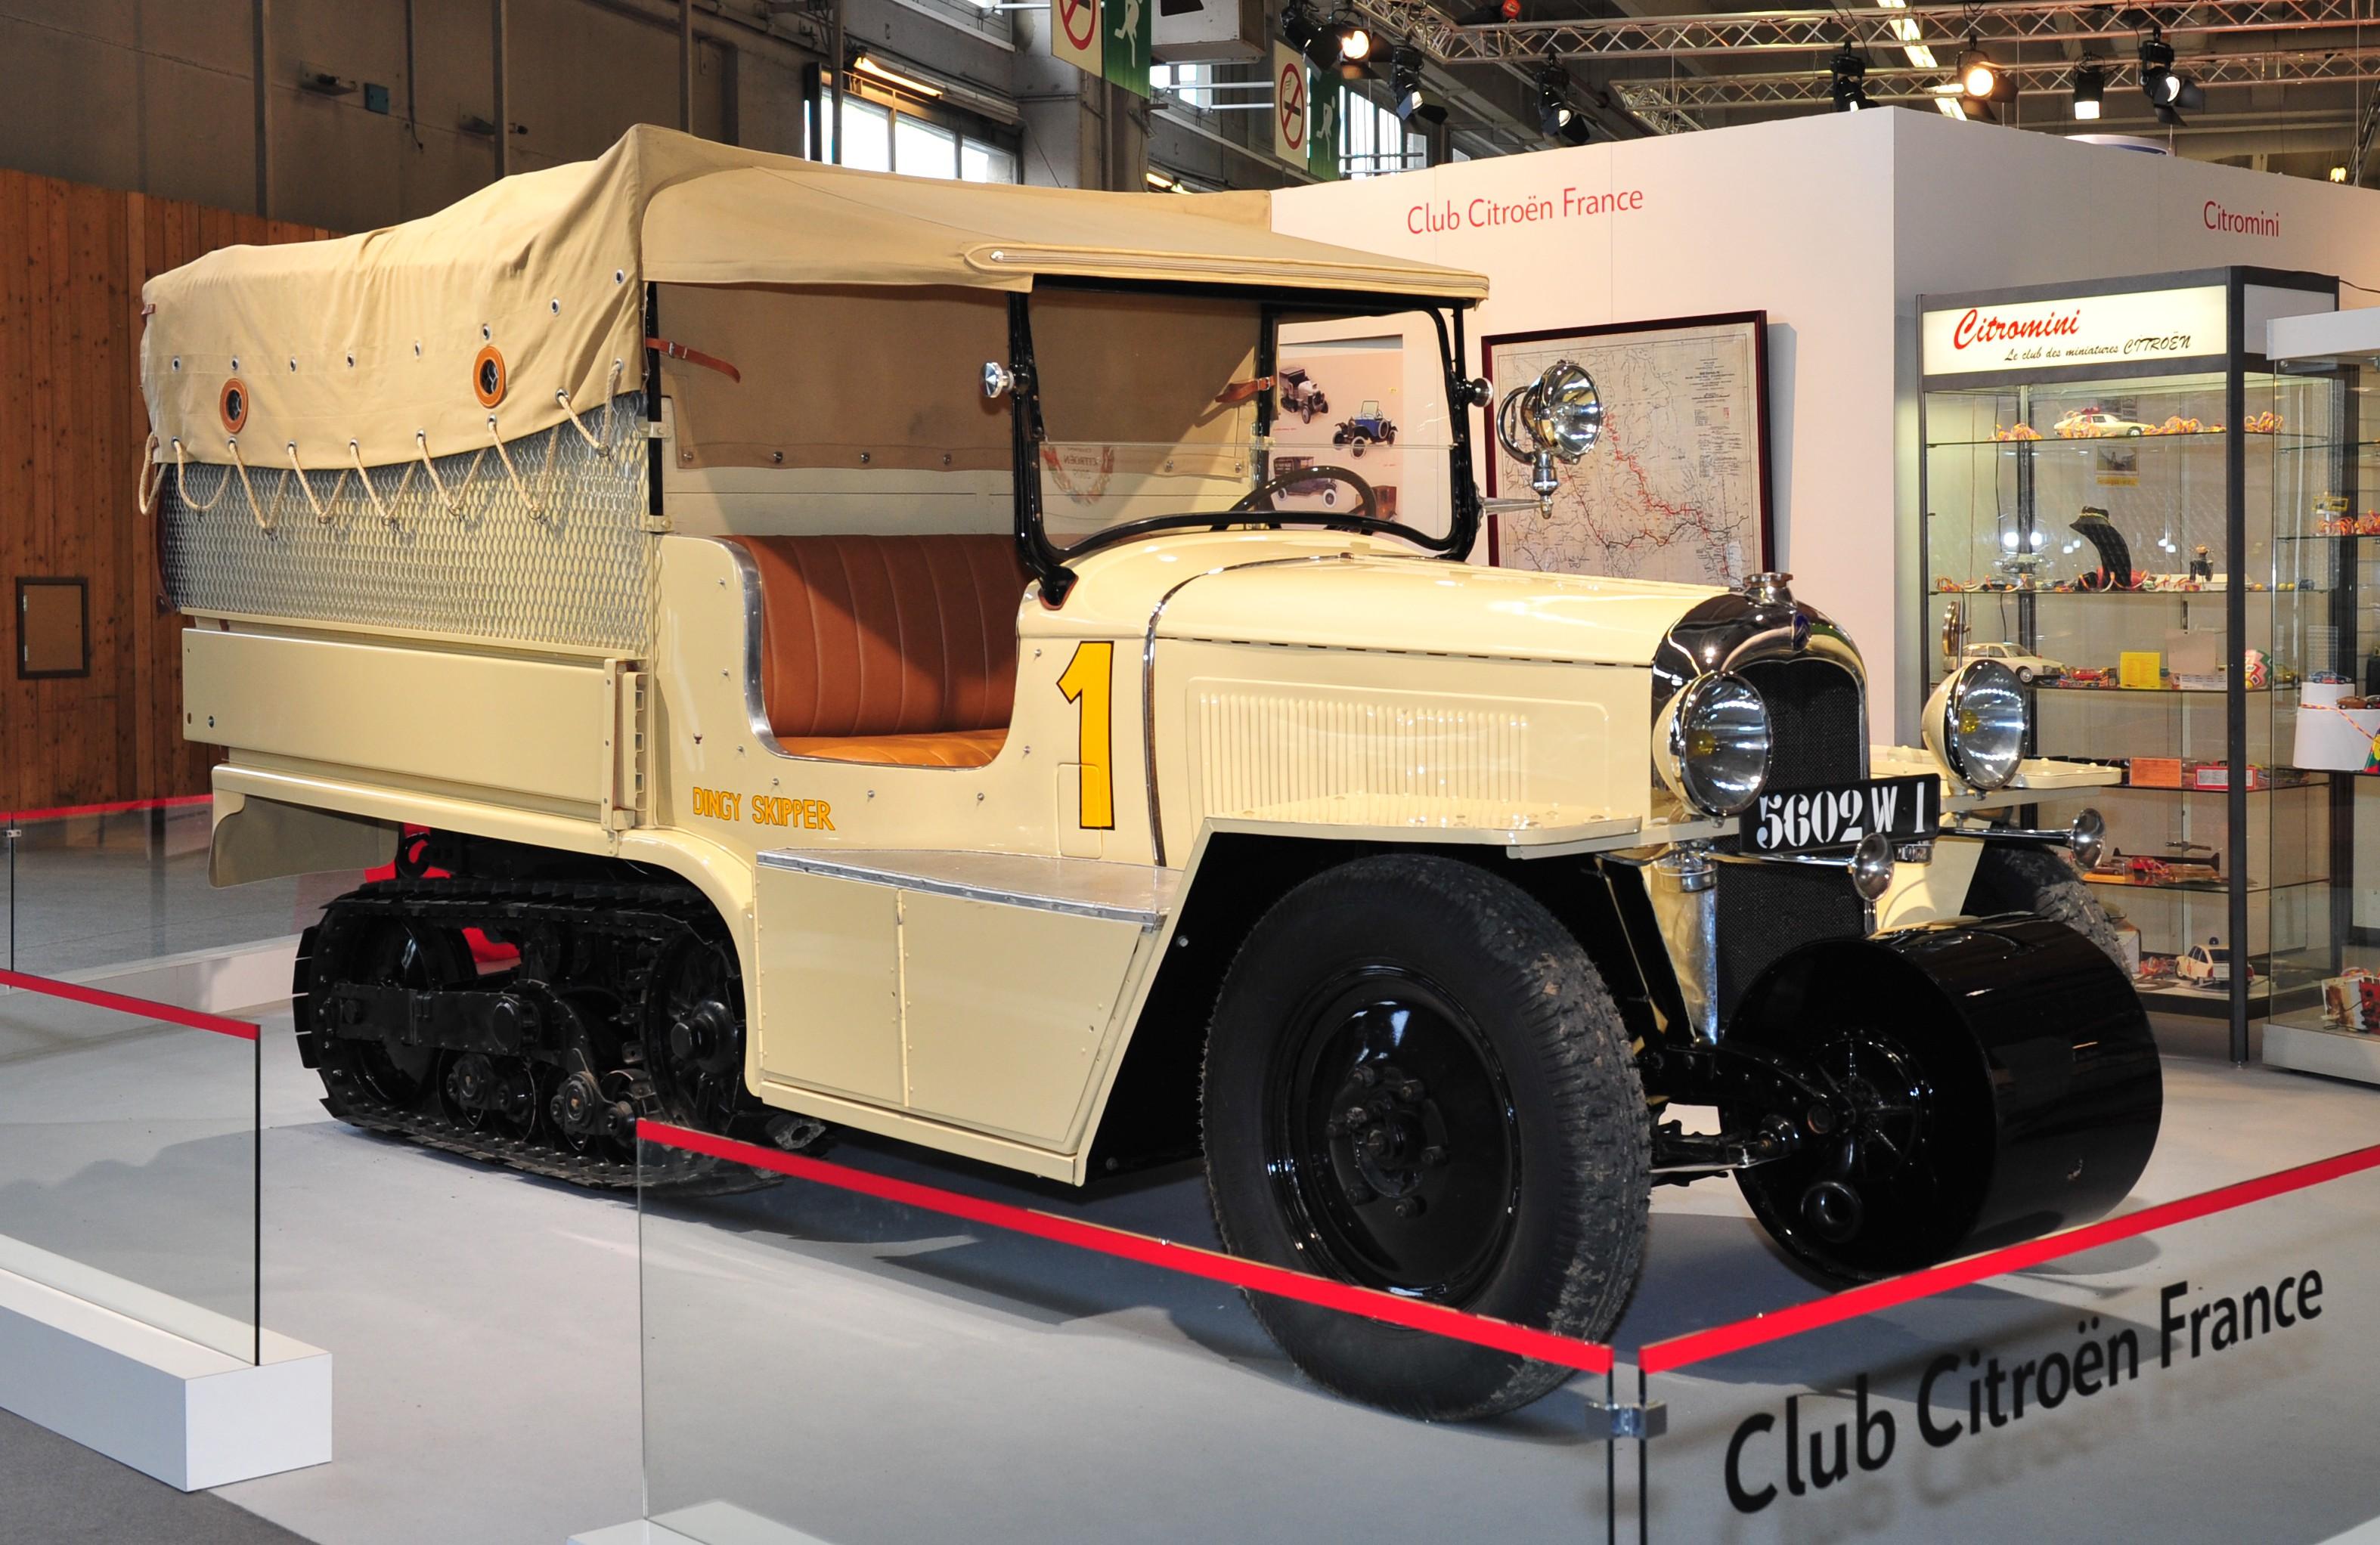 1934 Autochenille Citroën P17